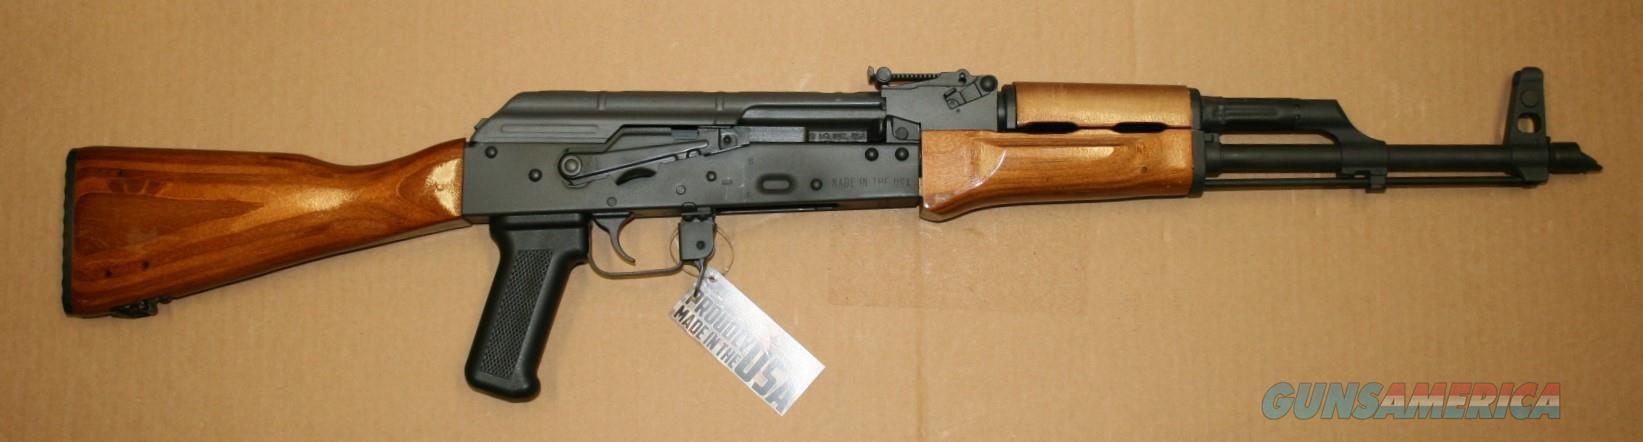 I.O.  Inc. IODM2008 AKM247C AK47 7.62 X 39 Laminated Wood 30+1  Guns > Rifles > Interarms Rifles